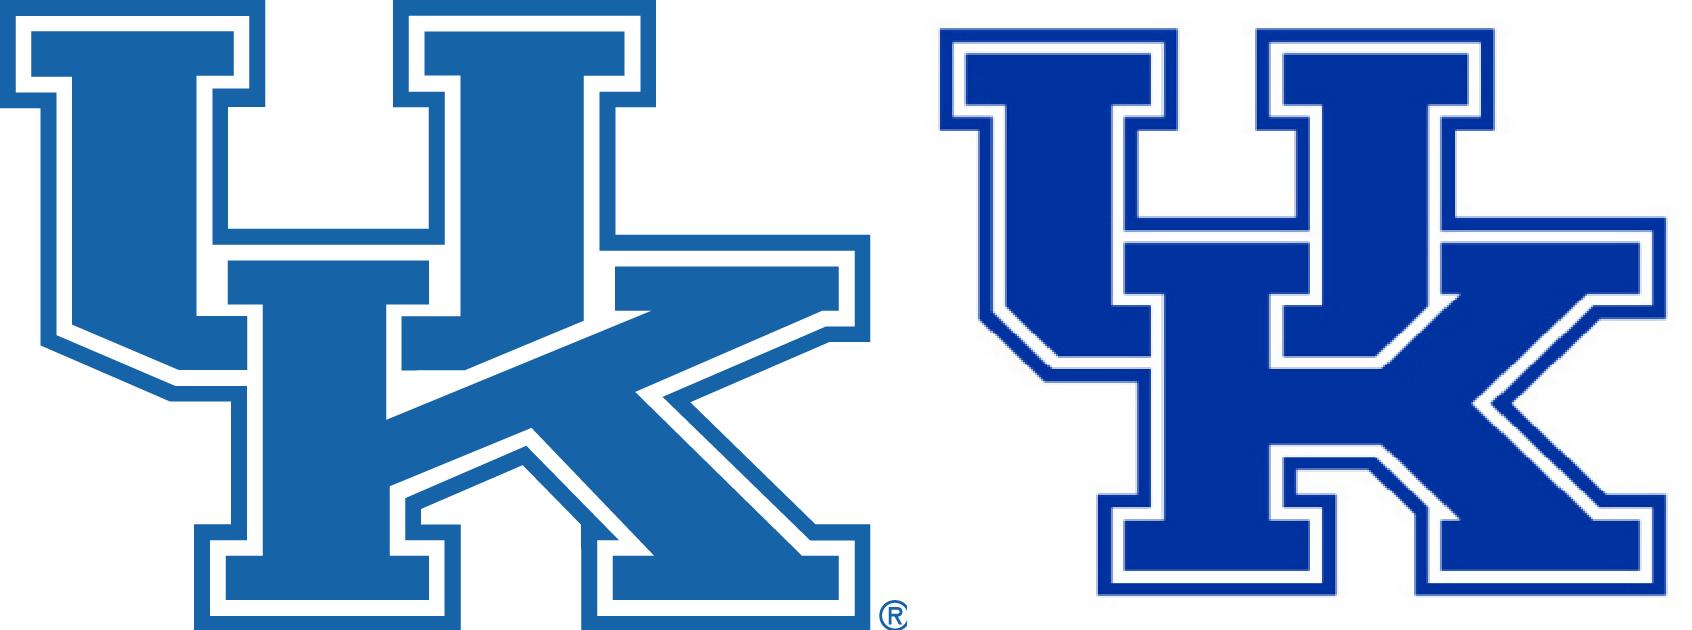 Kentucky Basketball And Football Getting New Uniforms